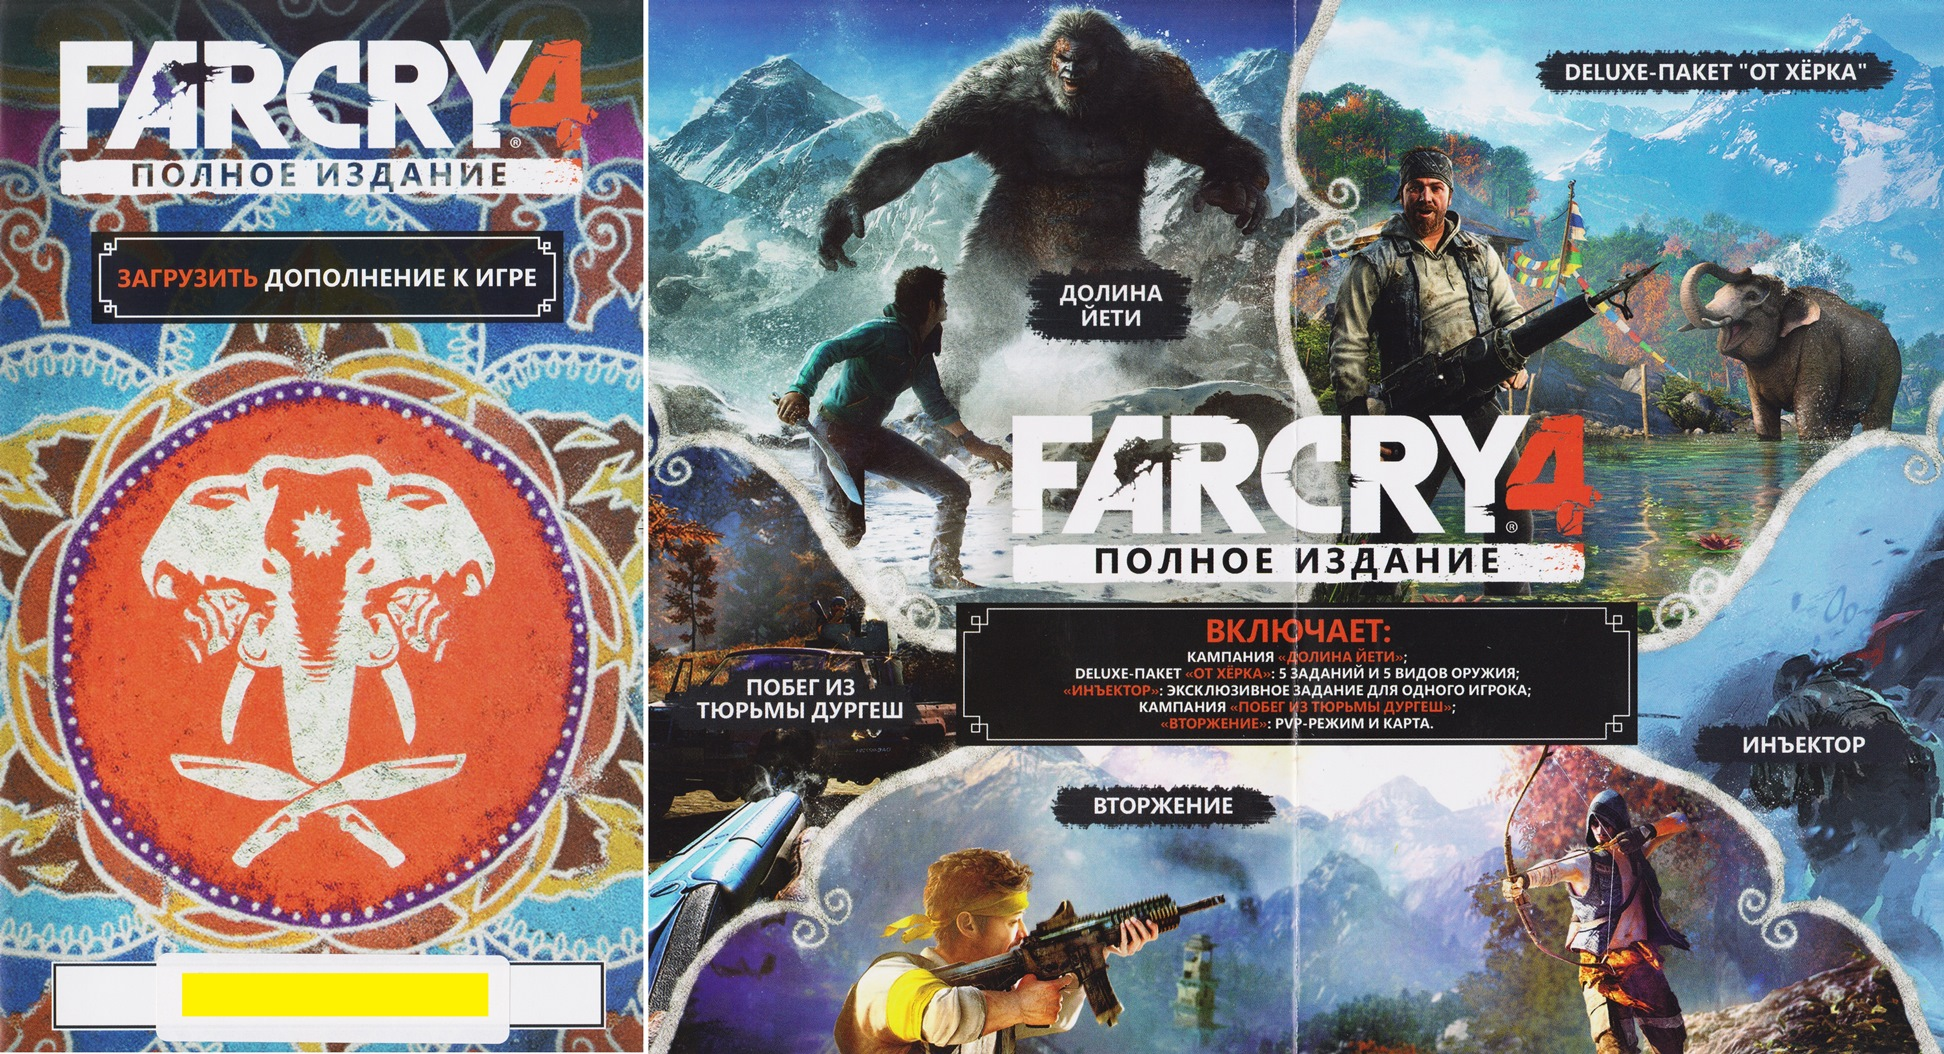 Код Активации Для Far Cry 4 Uplay